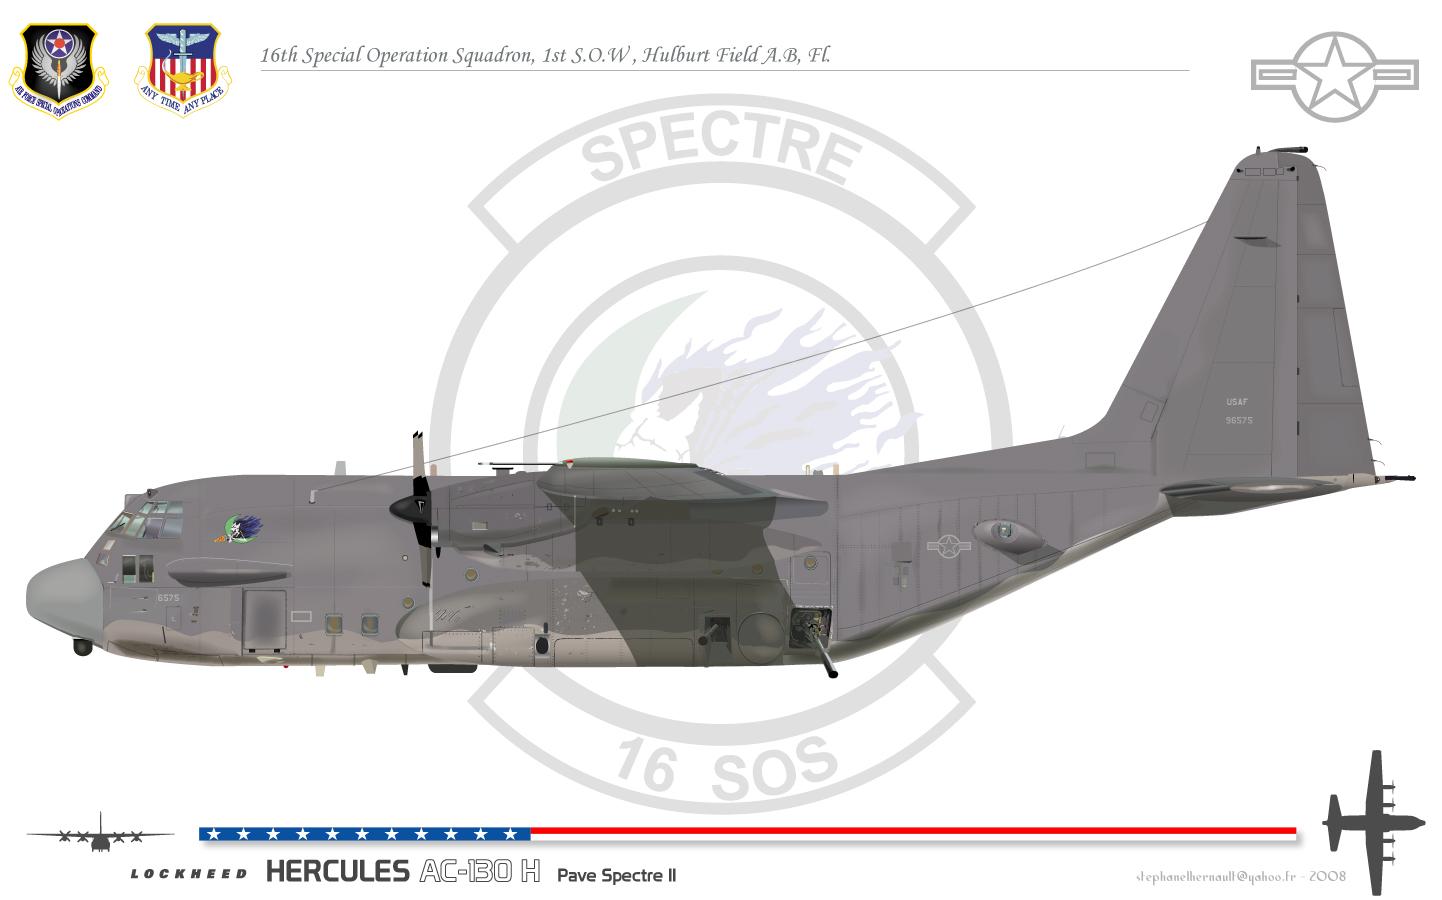 Lockheed C-130 Hercules (avión de transporte táctico medio/pesado USA) Pavespectreii